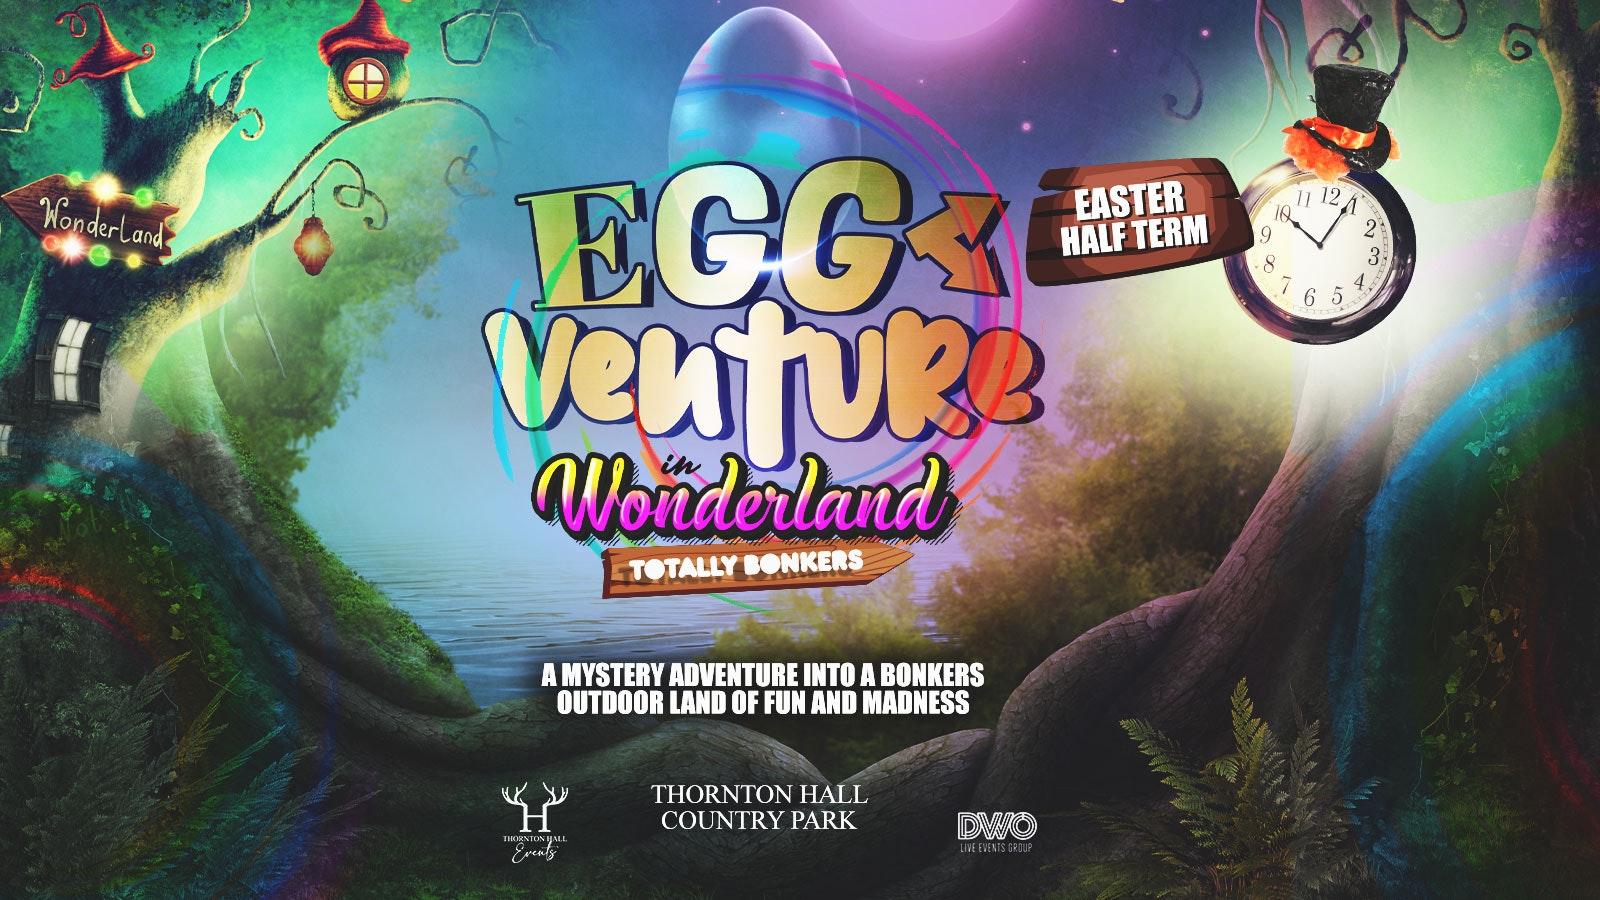 EggVenture in Wonderland – Wednesday 7th April – 12.30pm